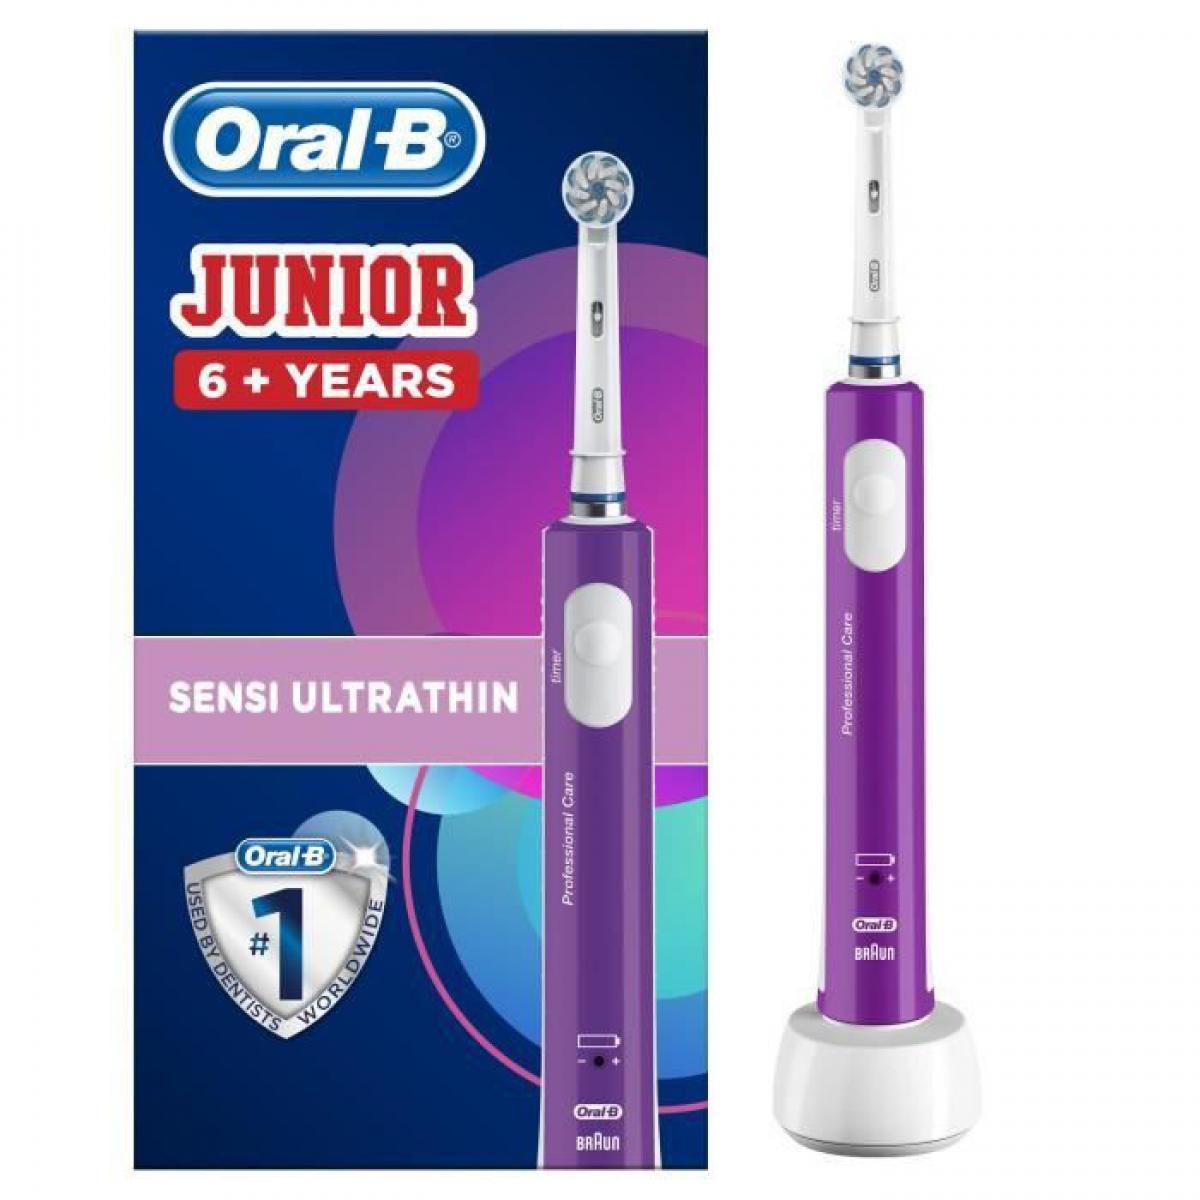 Oral-B braun - junior purple